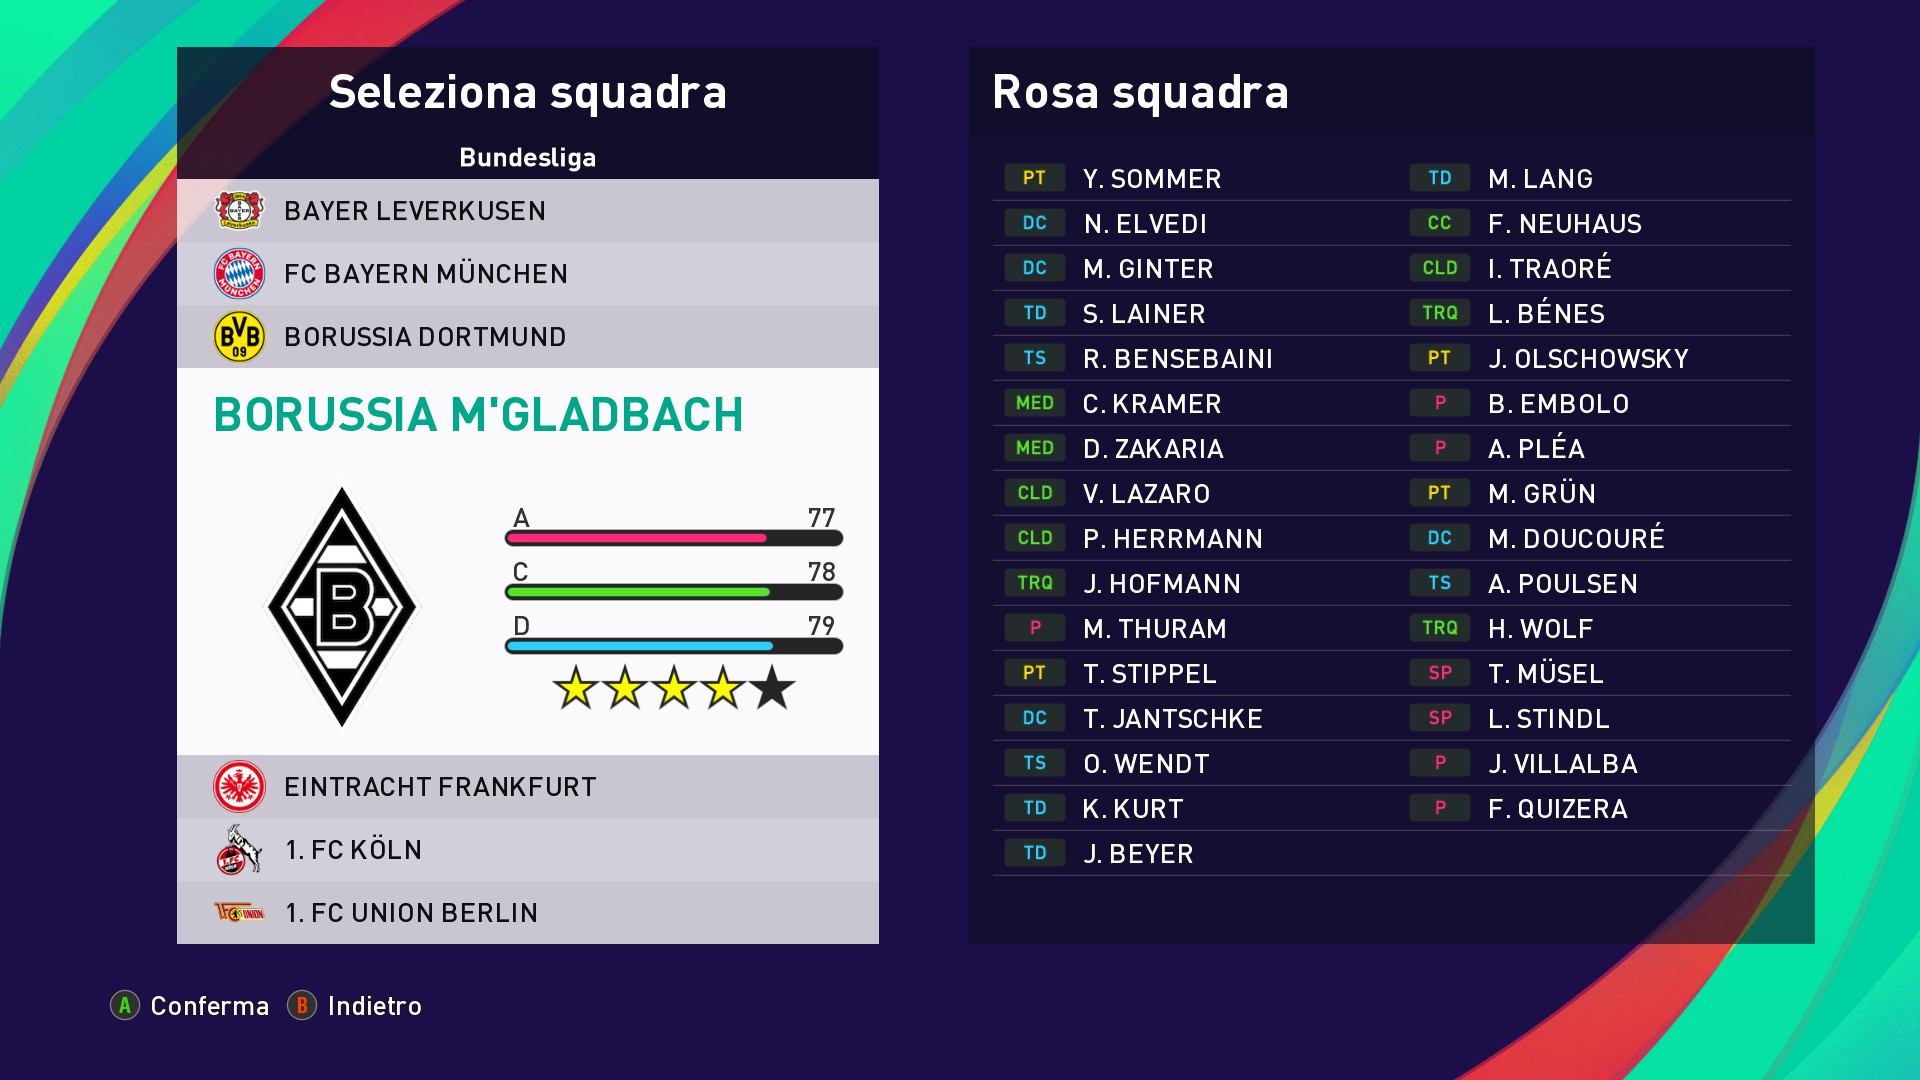 PES 2021 FO Option File   Real Team Names, Kits, Logos   Bundesliga, MLS, Jleague + Transfermarkt